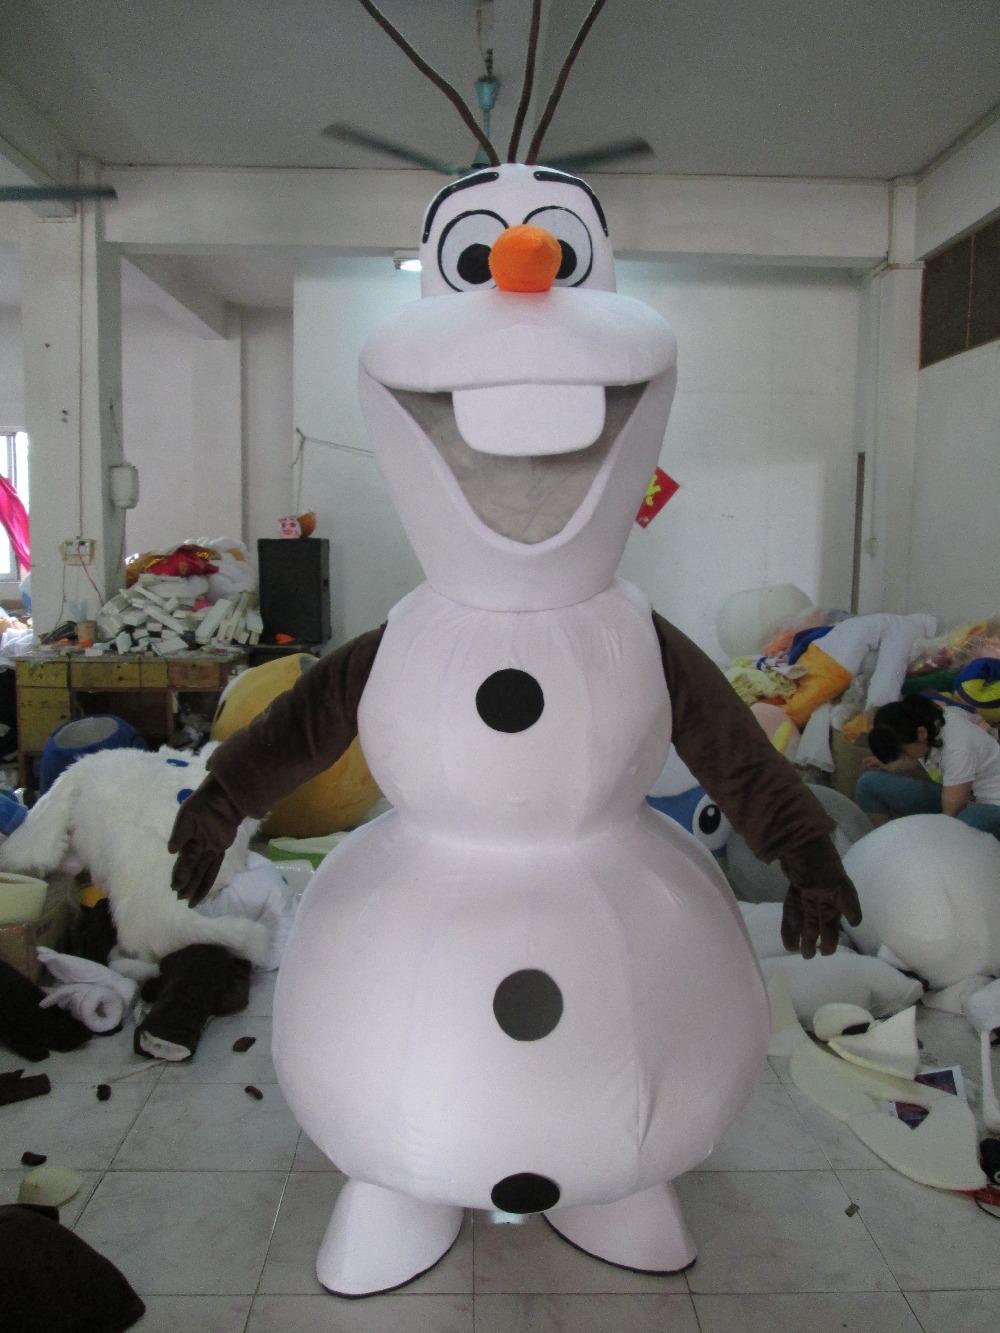 Costume bonhomme de neige olaf reine des neiges cosplay - Bonhomme de neige olaf ...